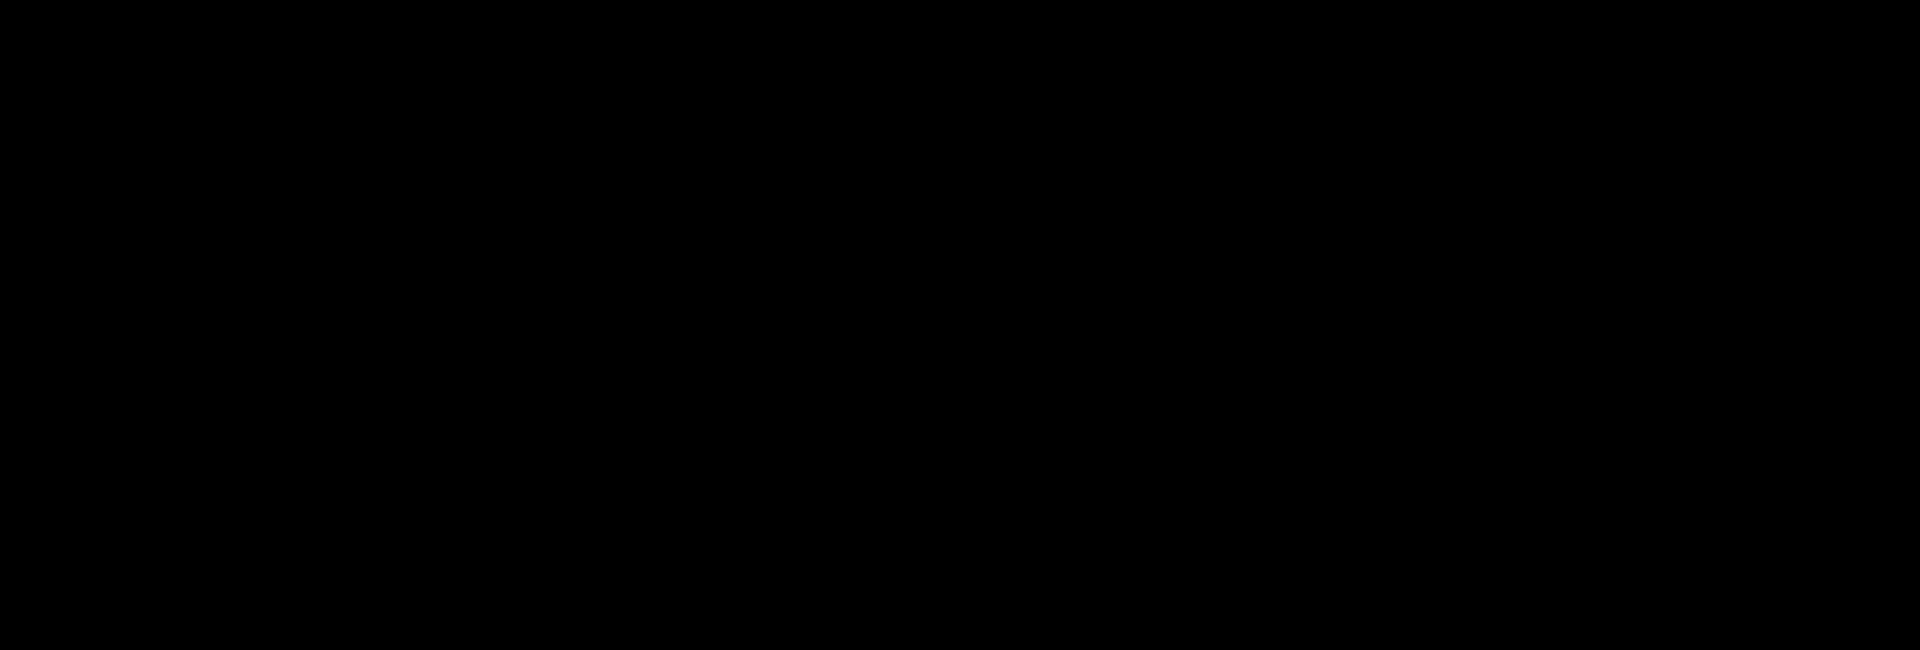 Borstvoedingscursus